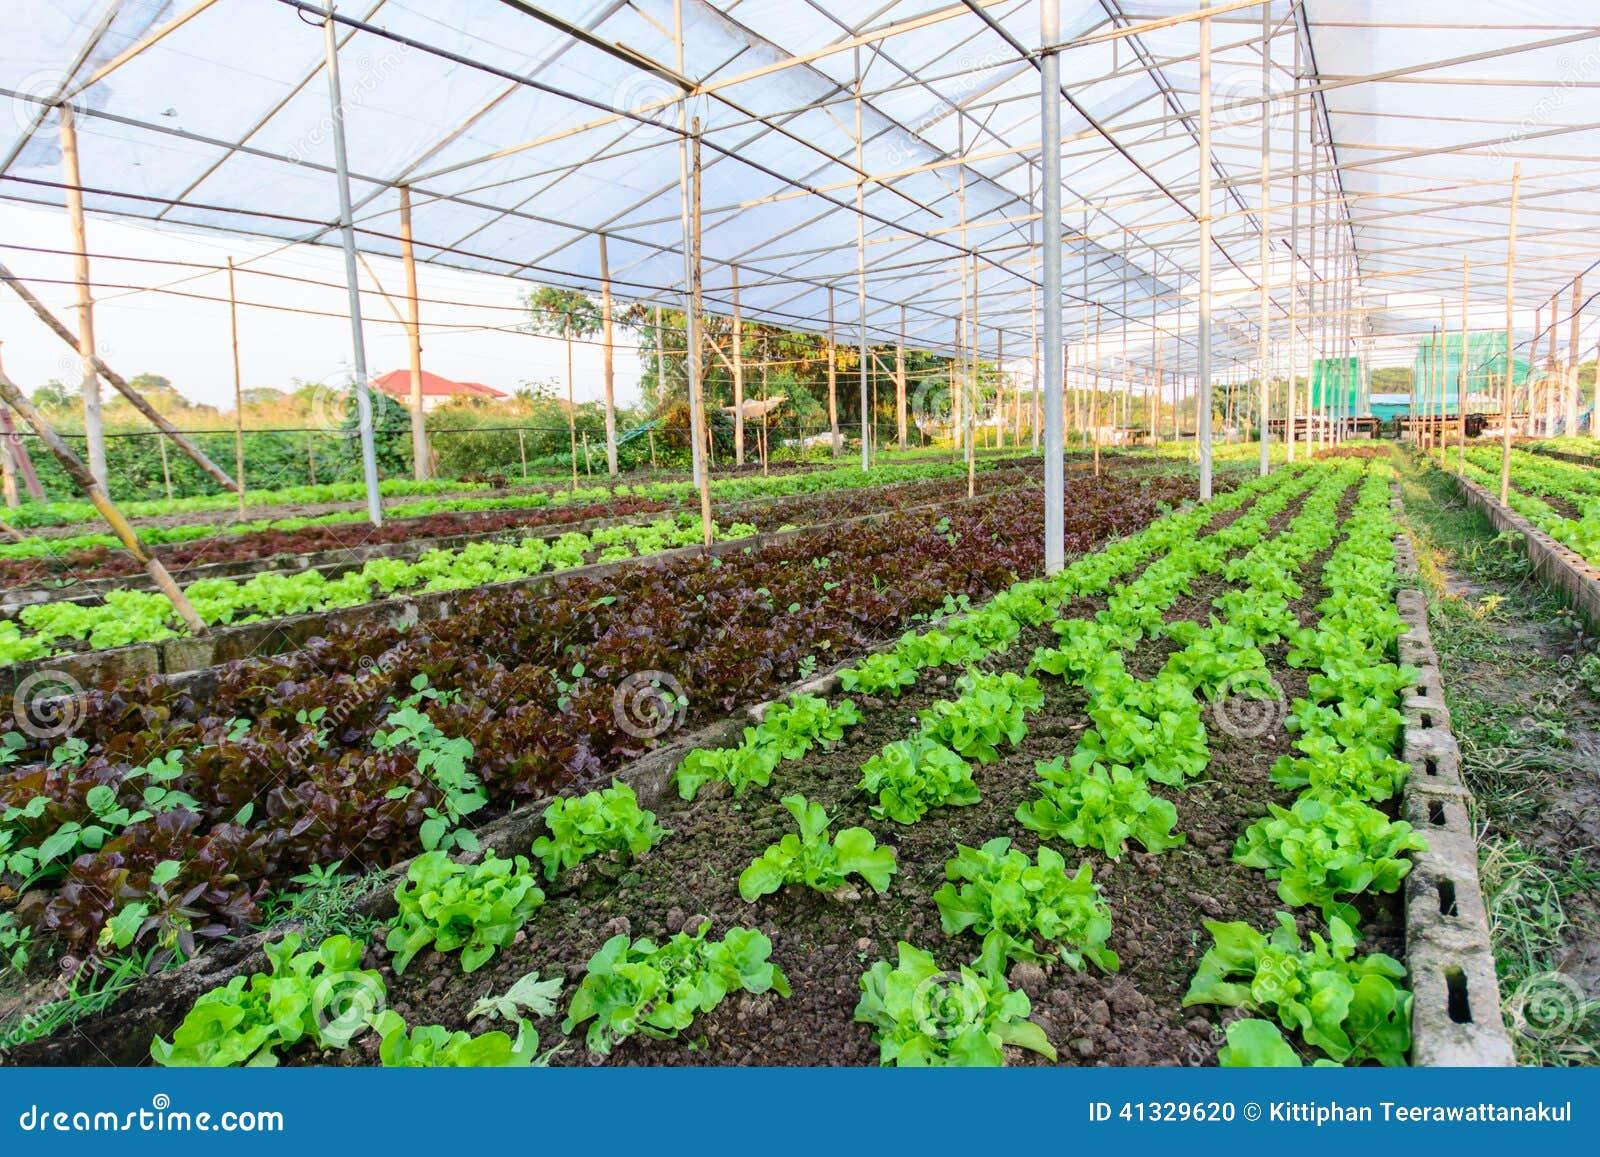 A Sample Vegetable Farming Business Plan Template